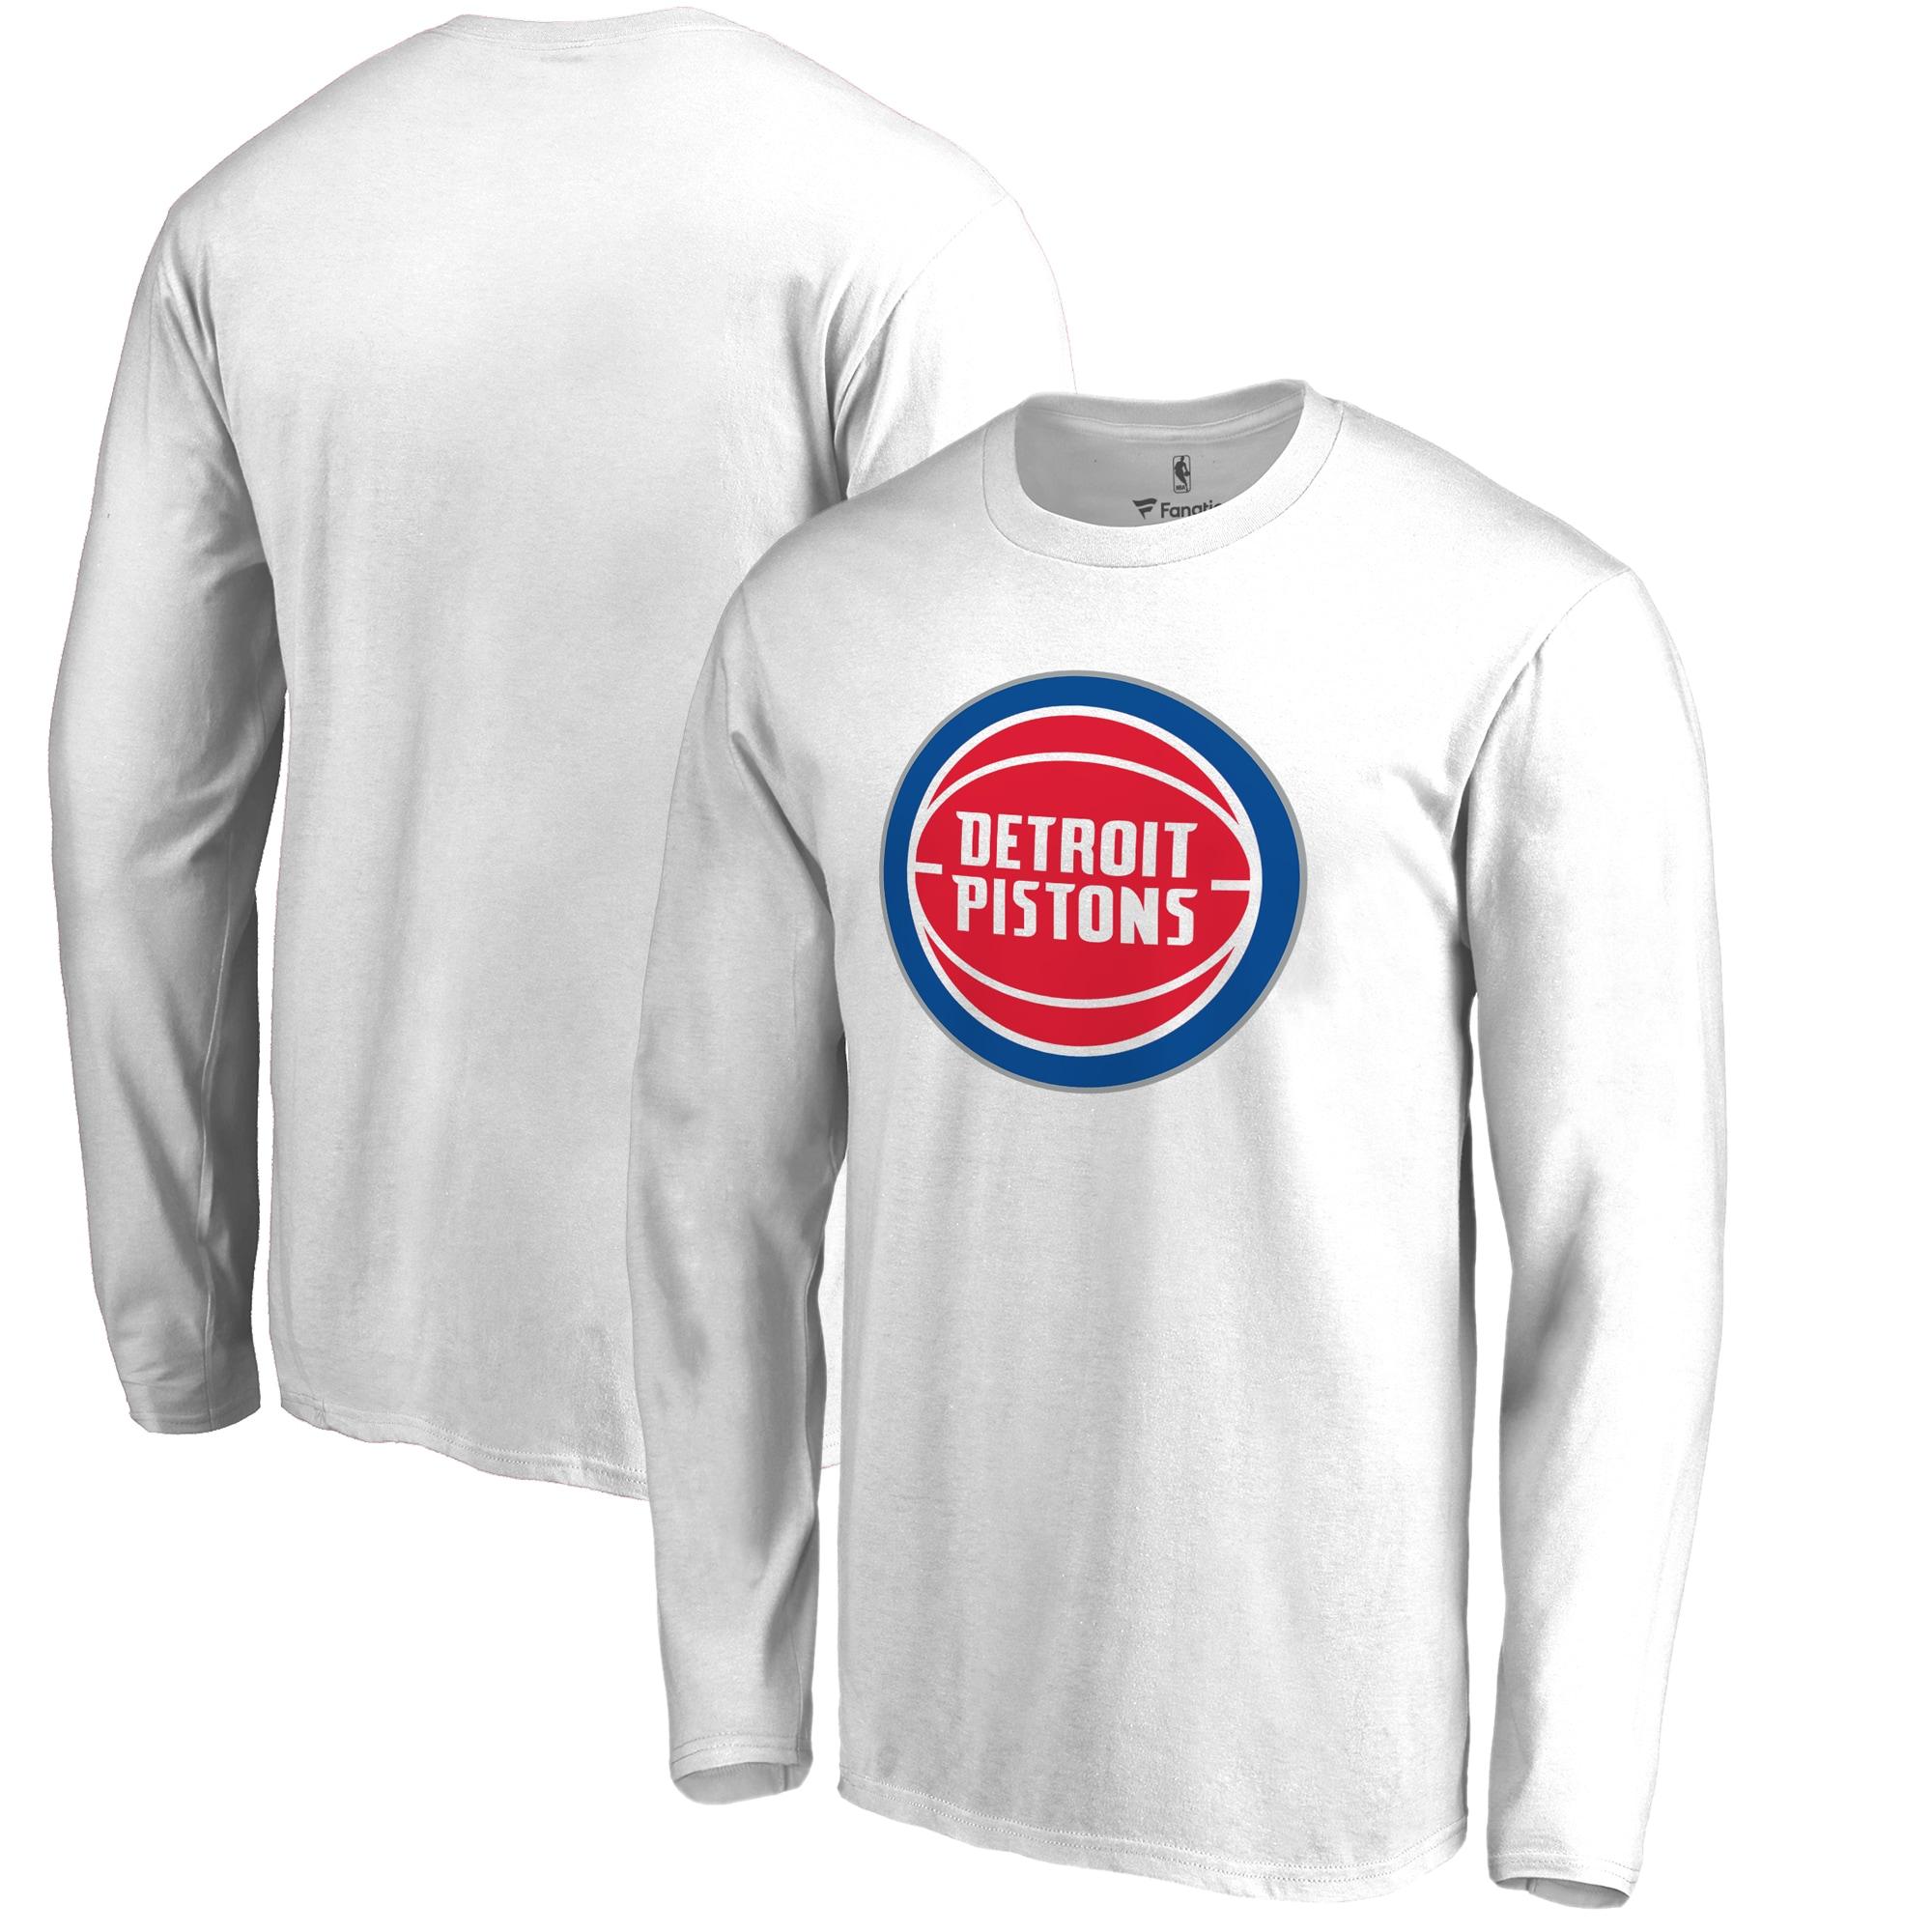 Detroit Pistons Fanatics Branded Primary Logo Long Sleeve T-Shirt - White